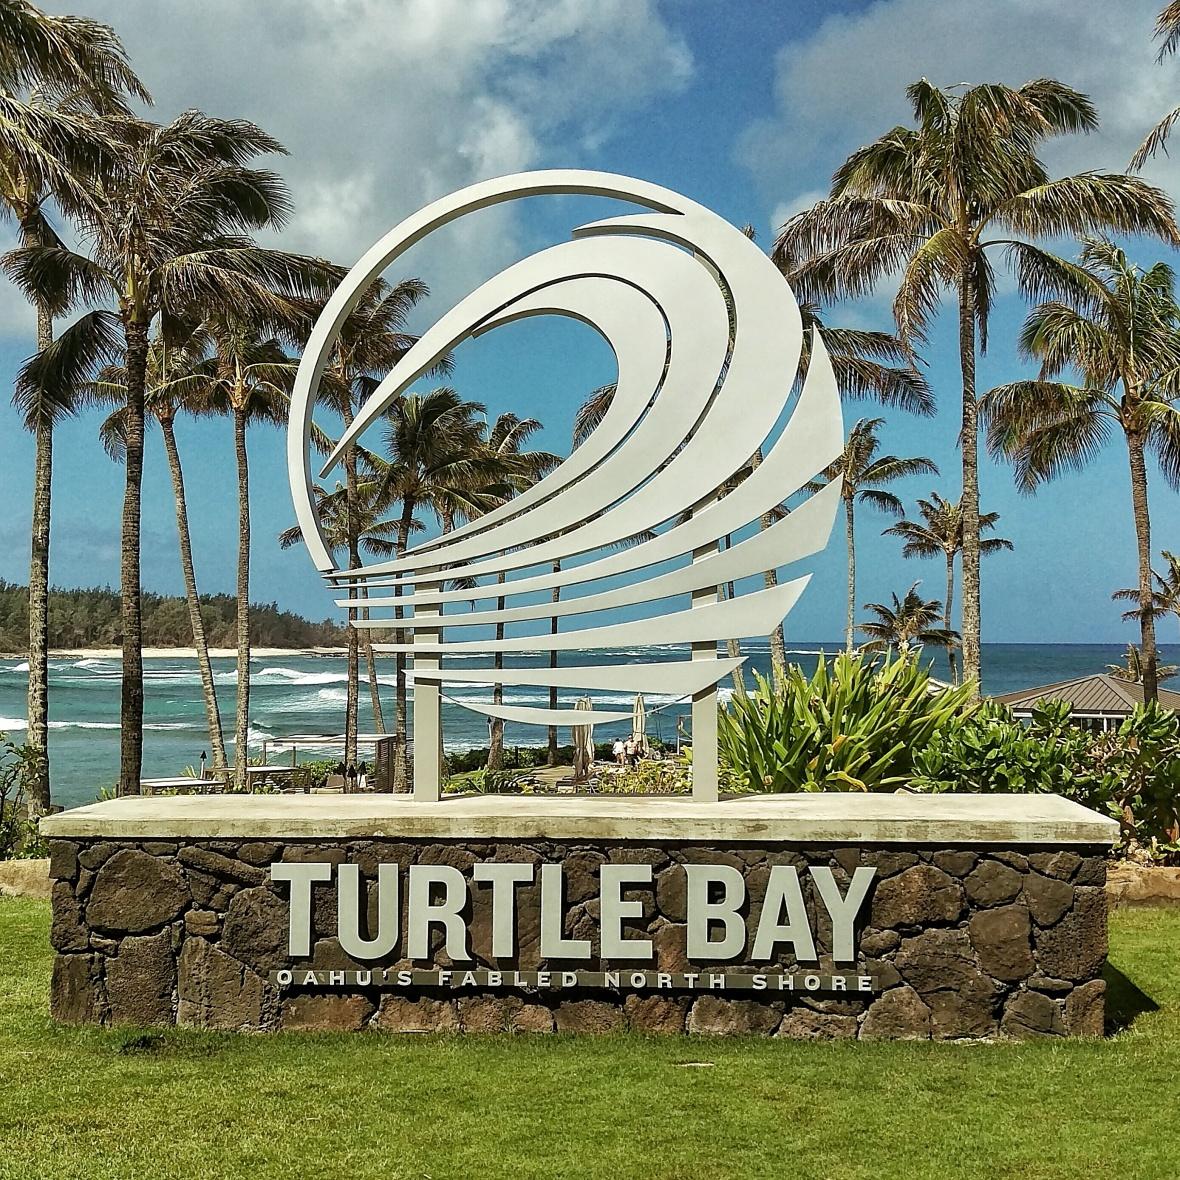 Turtle Bay Resort Signage